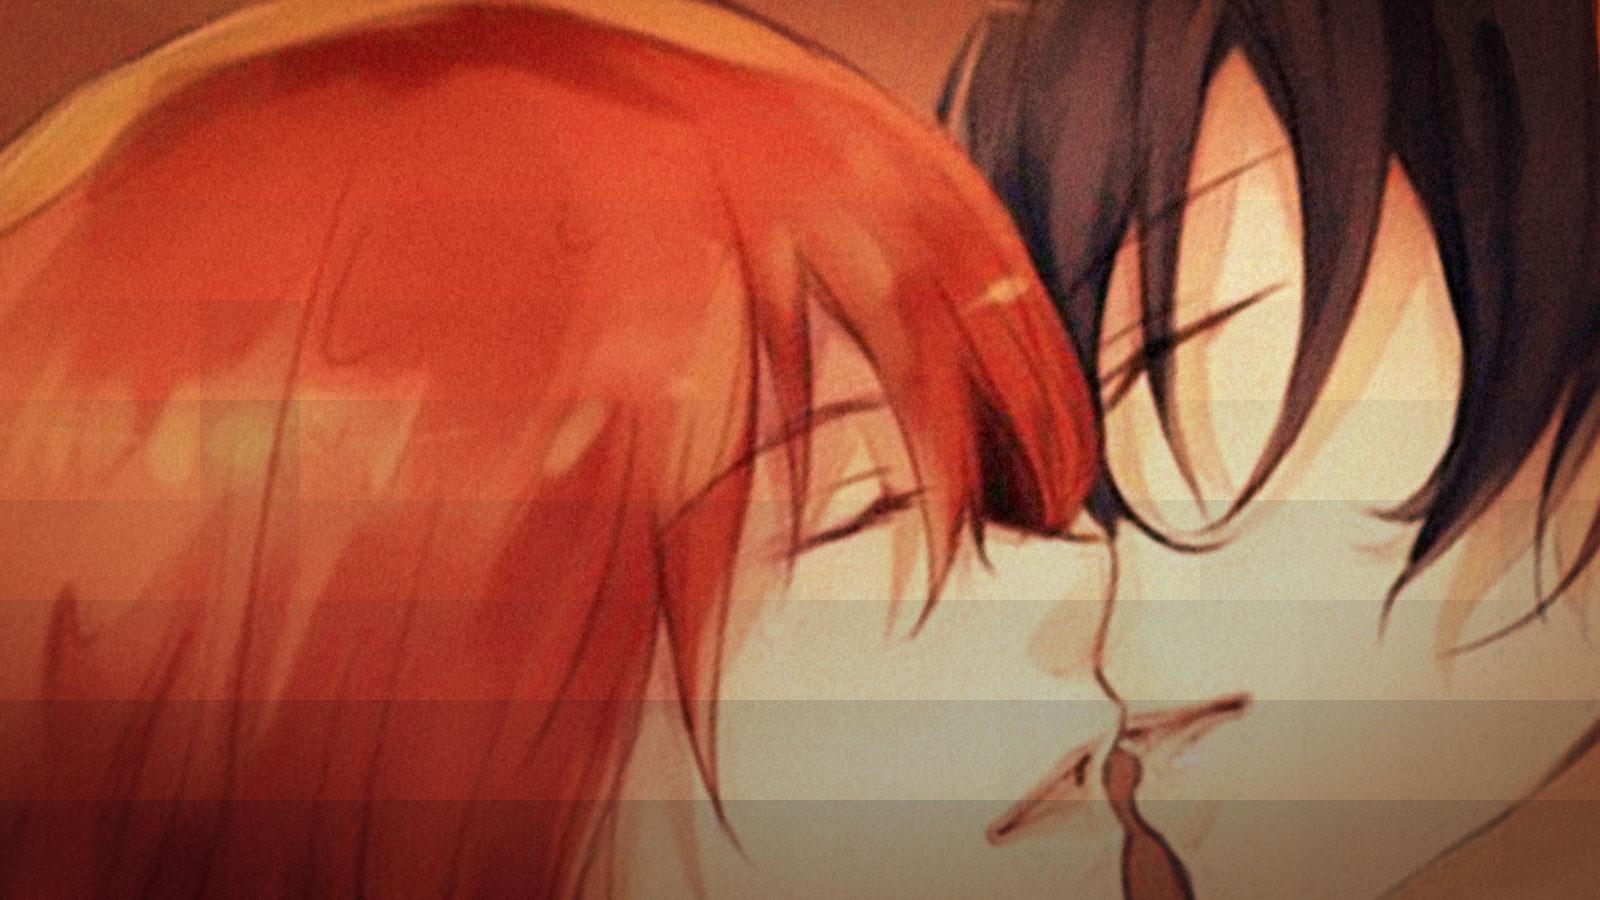 Online anime hookup sims for guys